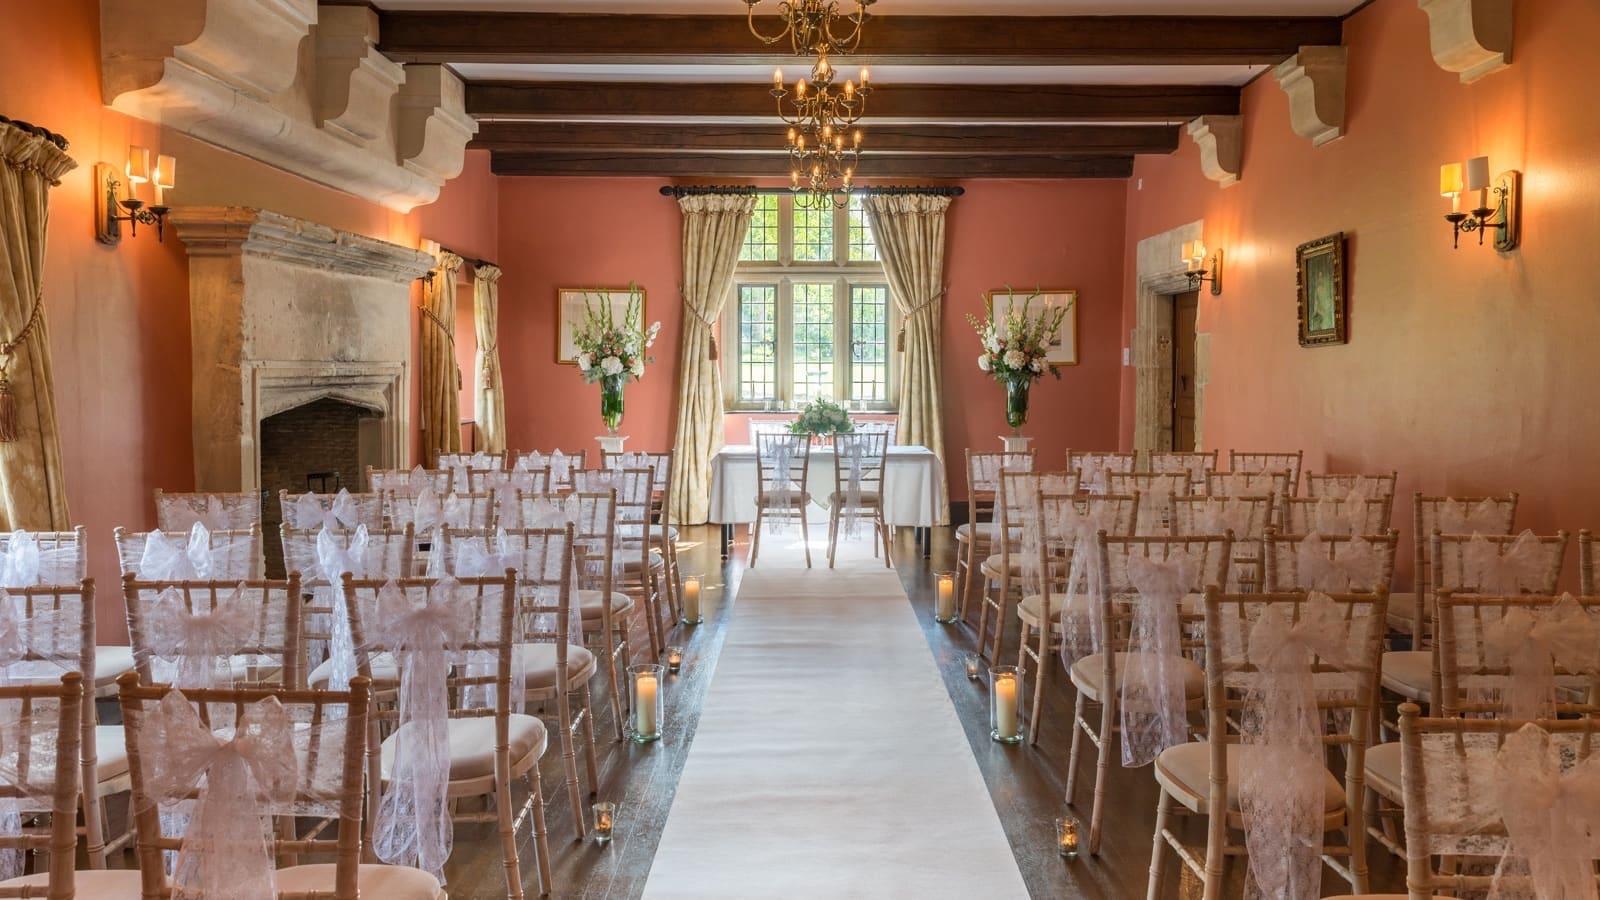 Indoor ballroom decorated for wedding ceremonies at Guyers House Hotel & Restaurant